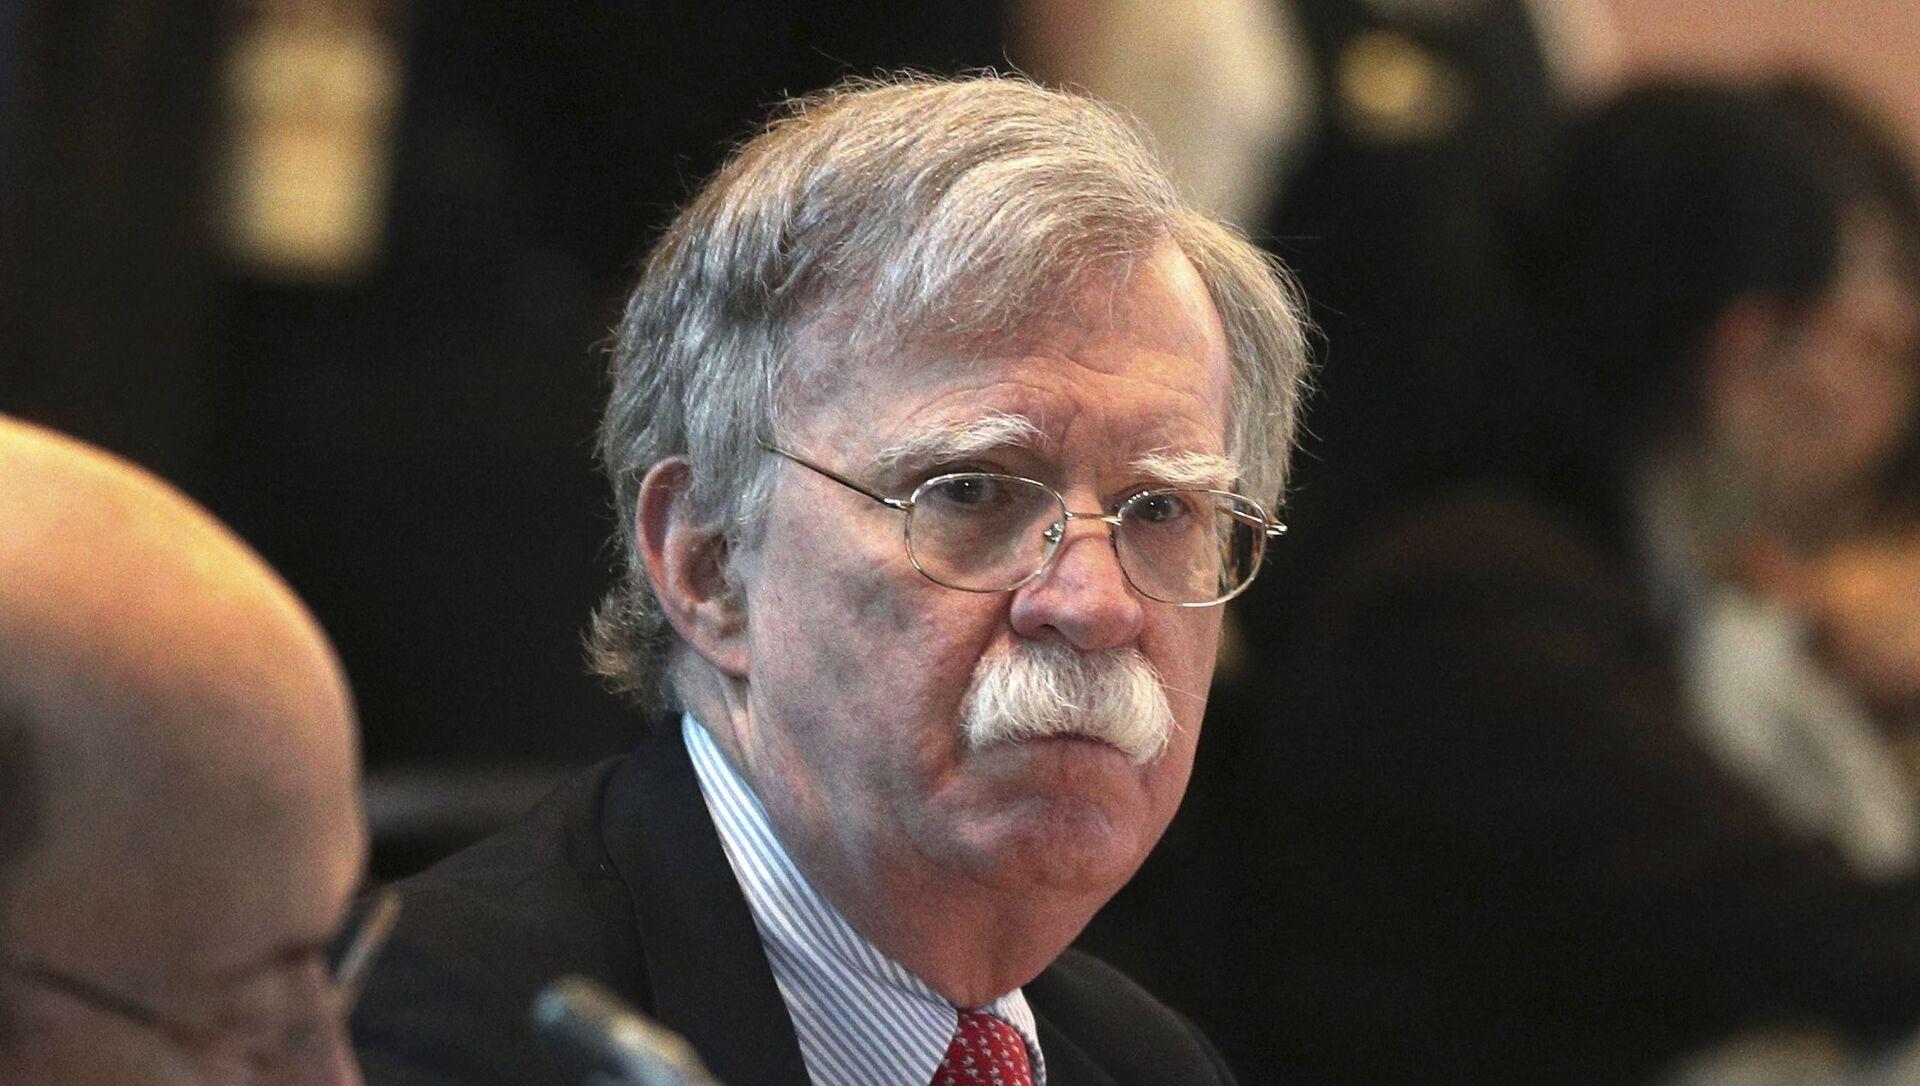 Former US national security advisor John Bolton - Sputnik International, 1920, 06.04.2021